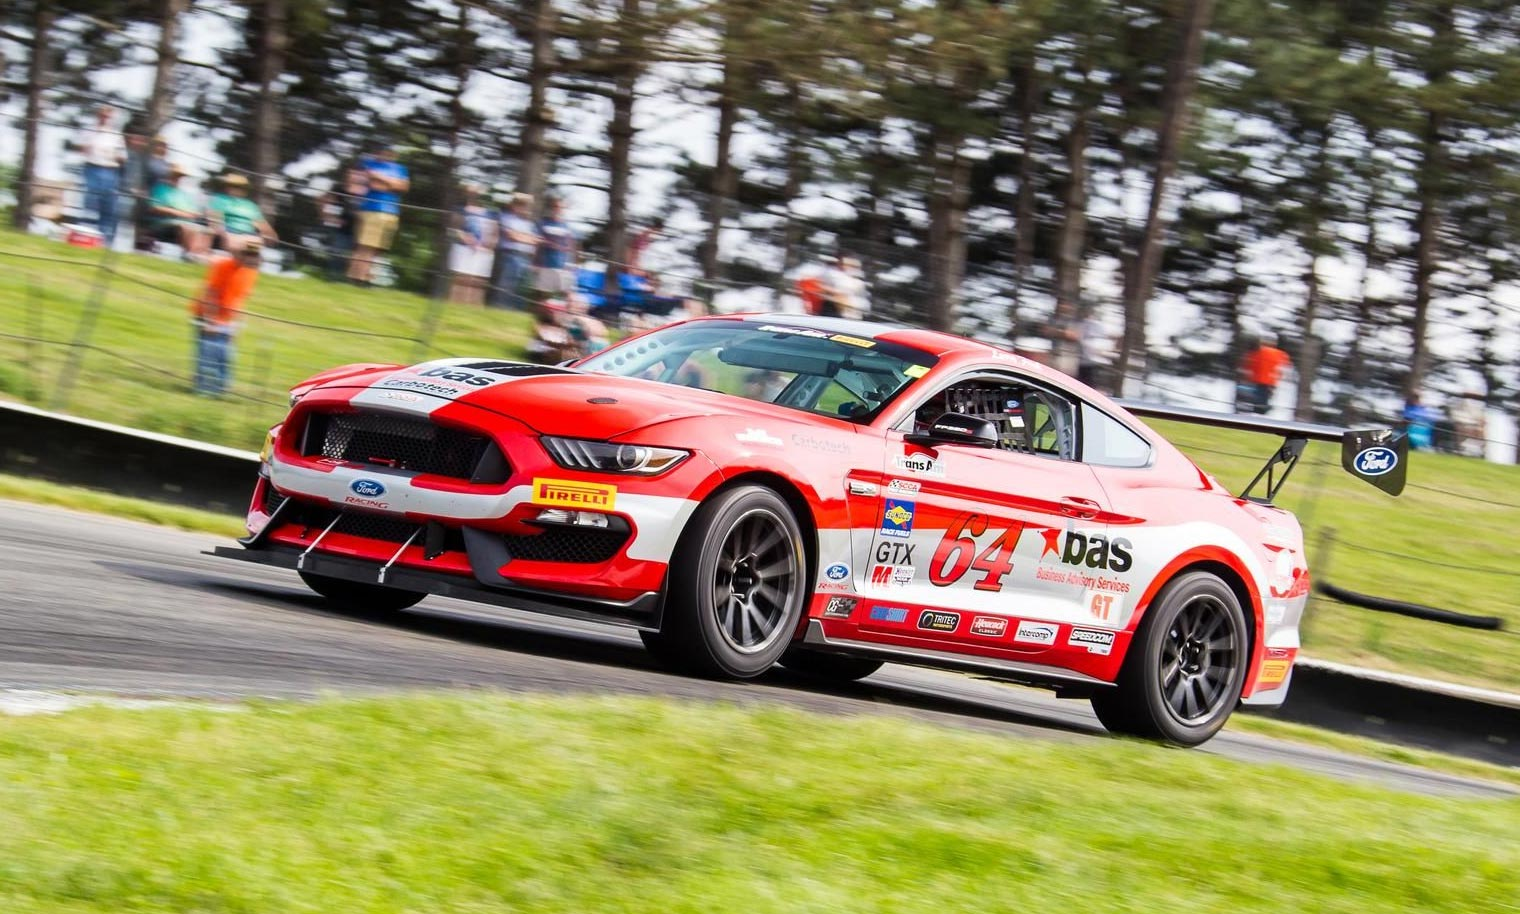 Ford Mustang im Rennsport